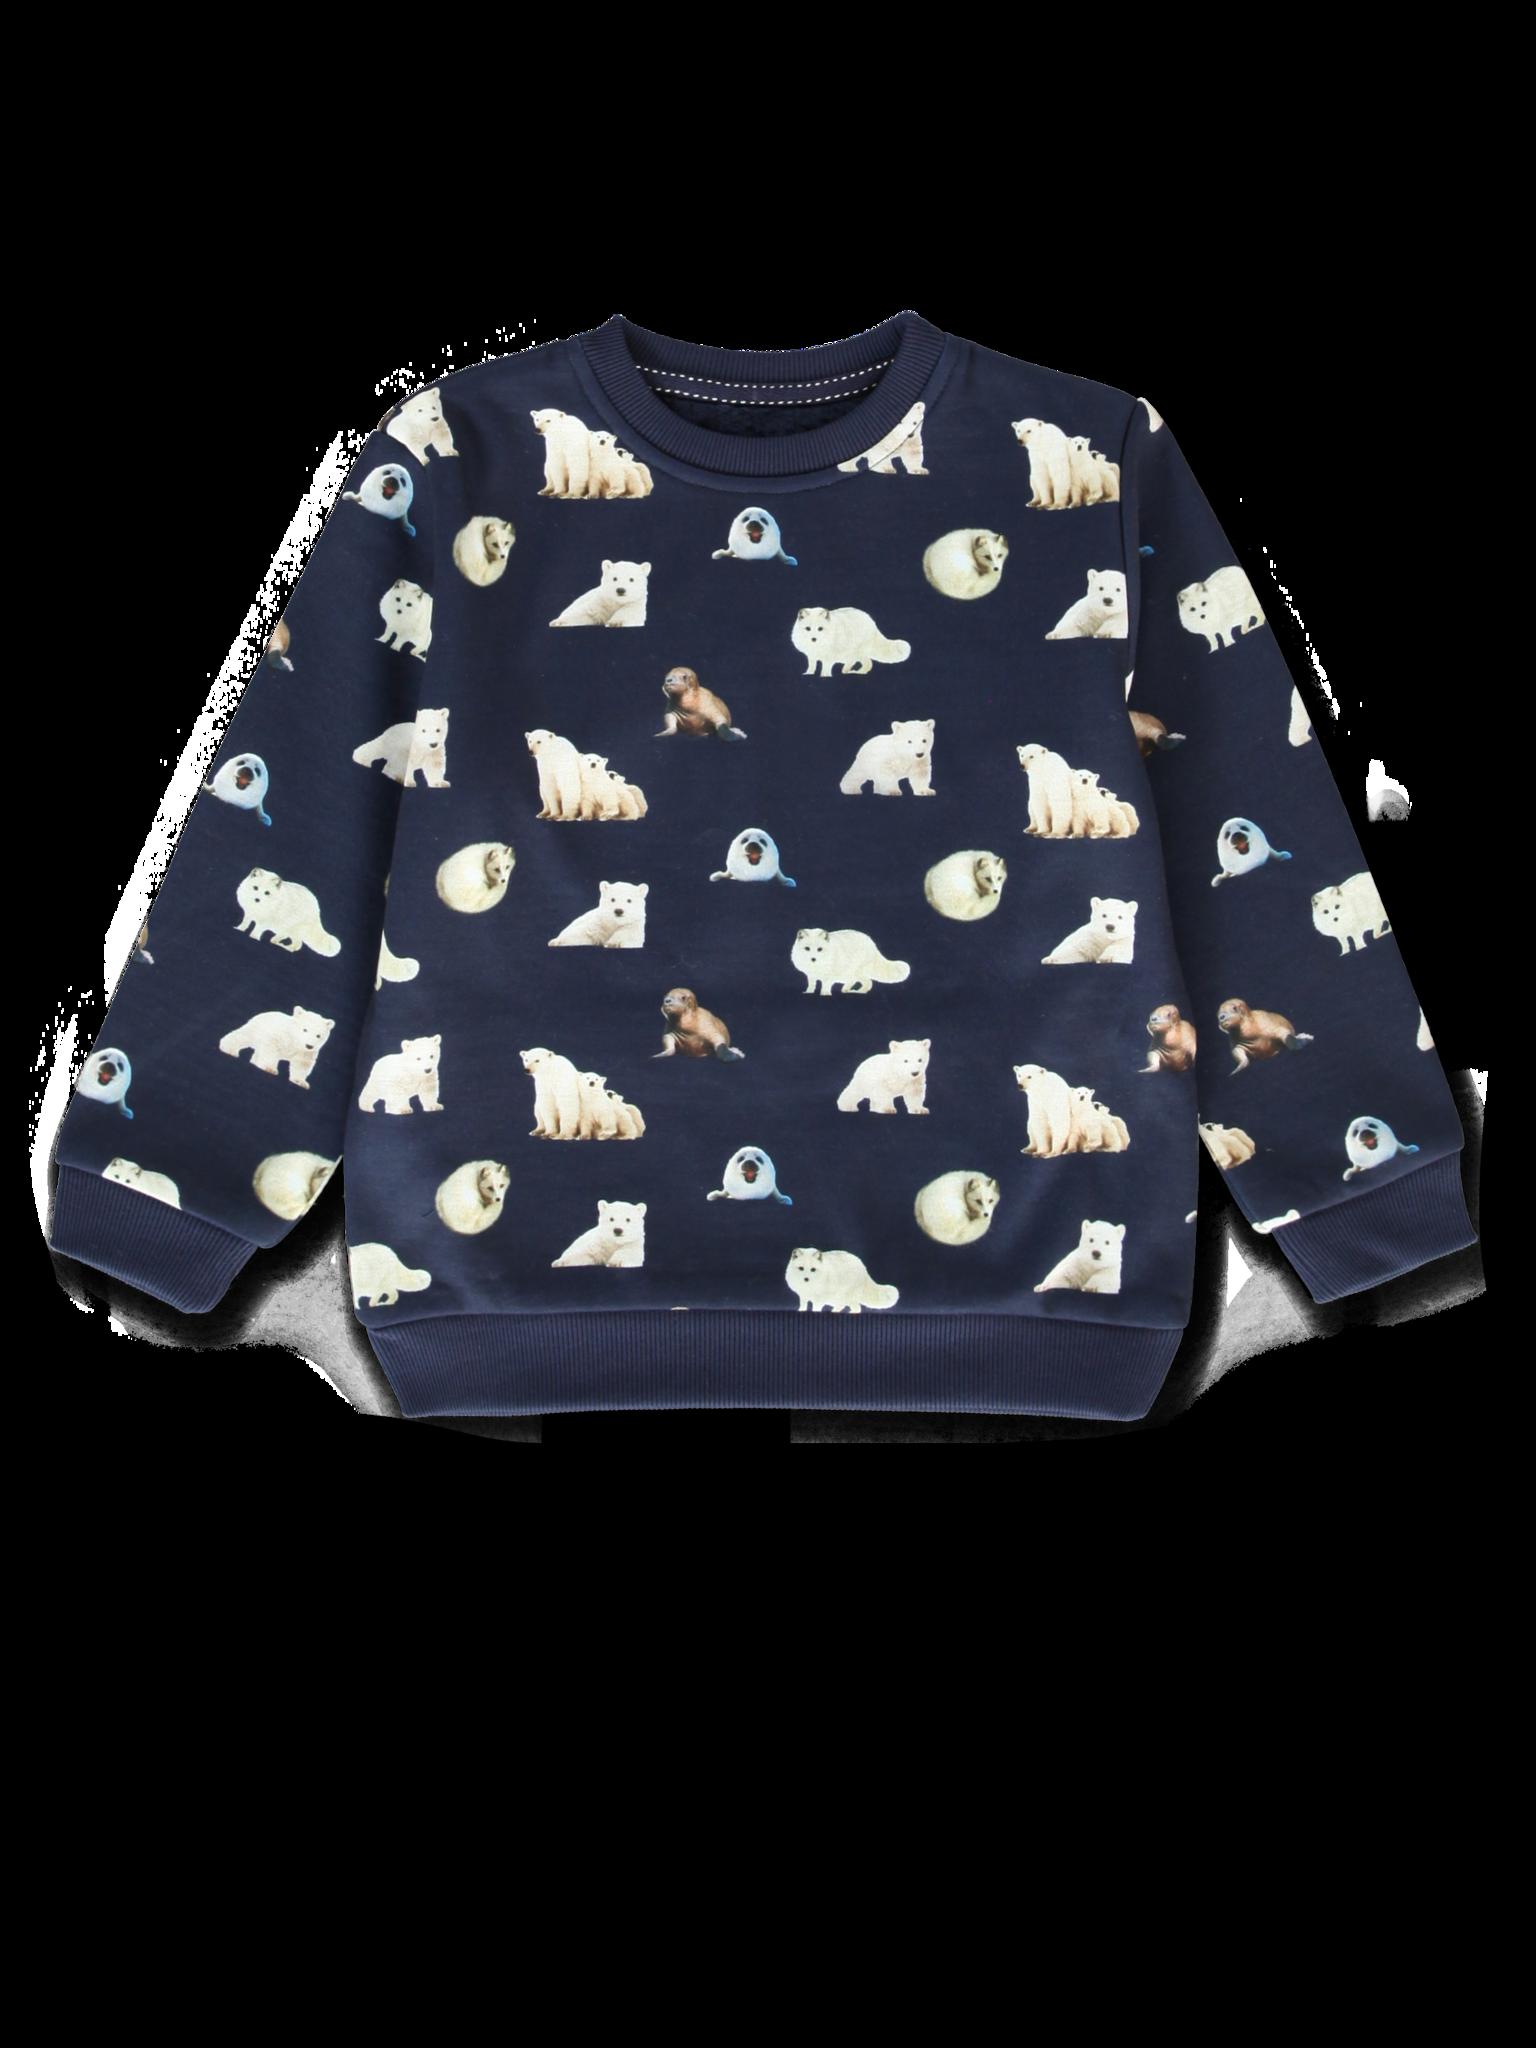 All Brands   Winterproducts Small Boys   Sweatshirt   12 pcs/box